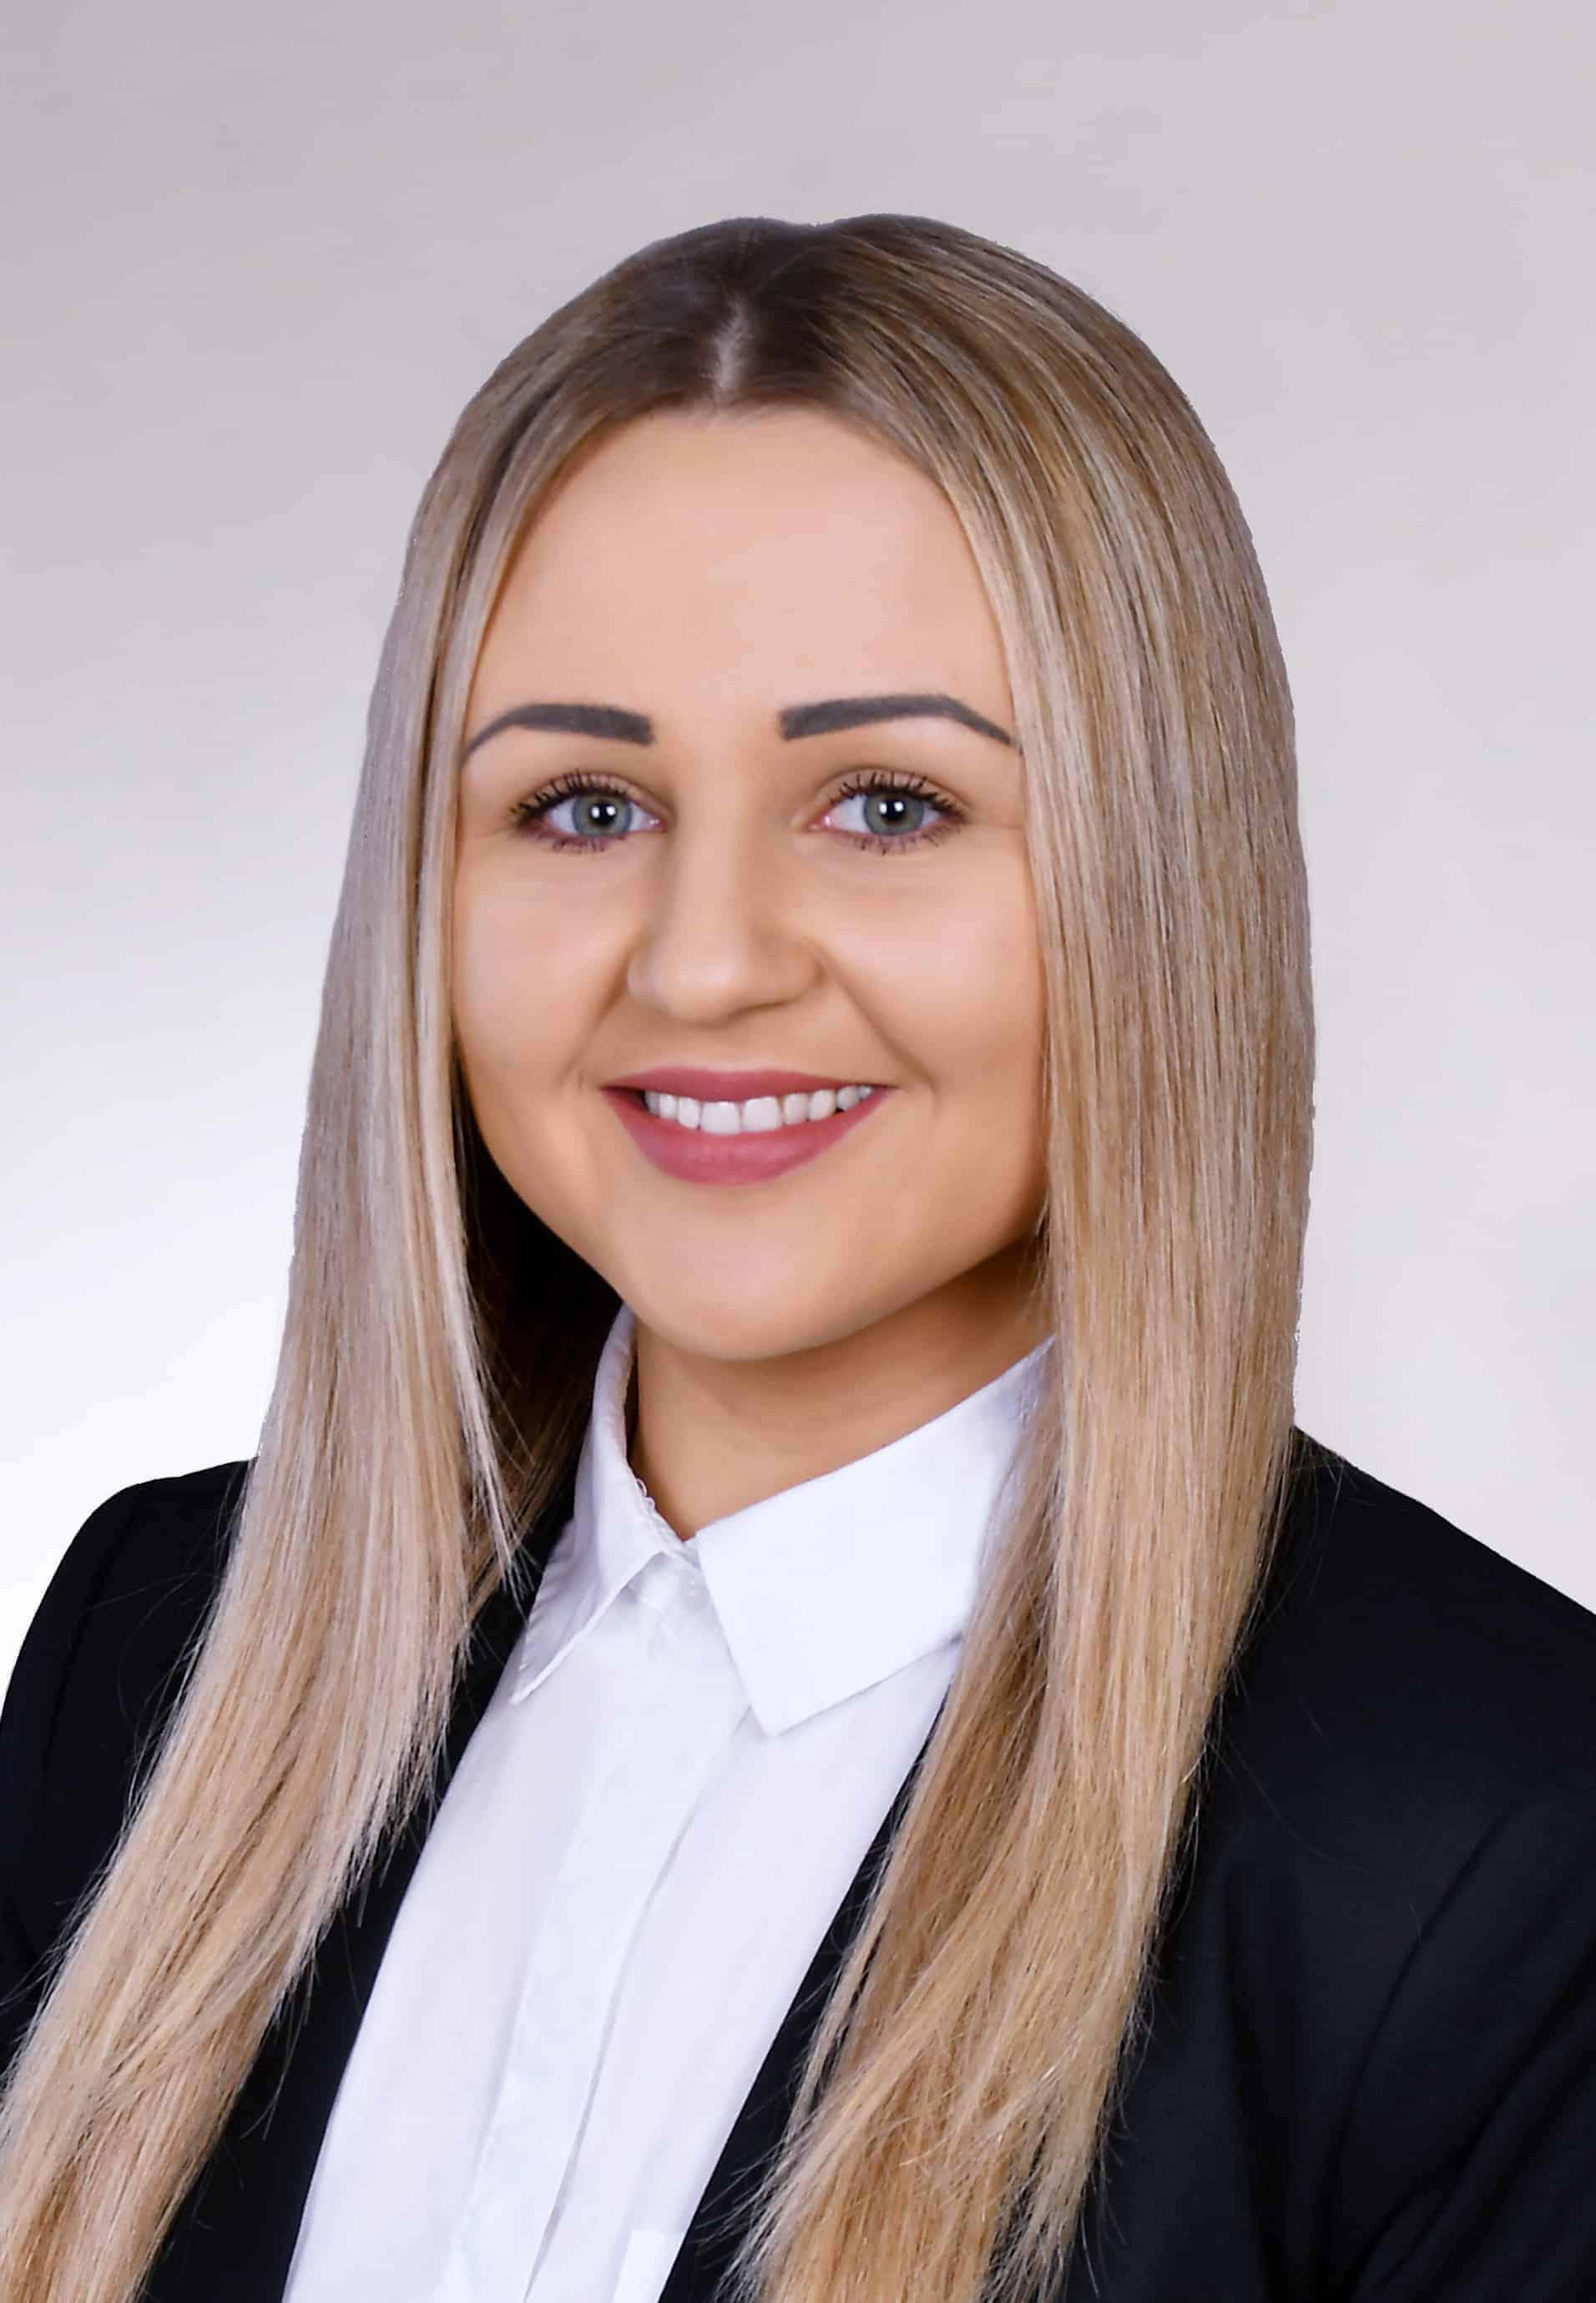 Kristina Becht